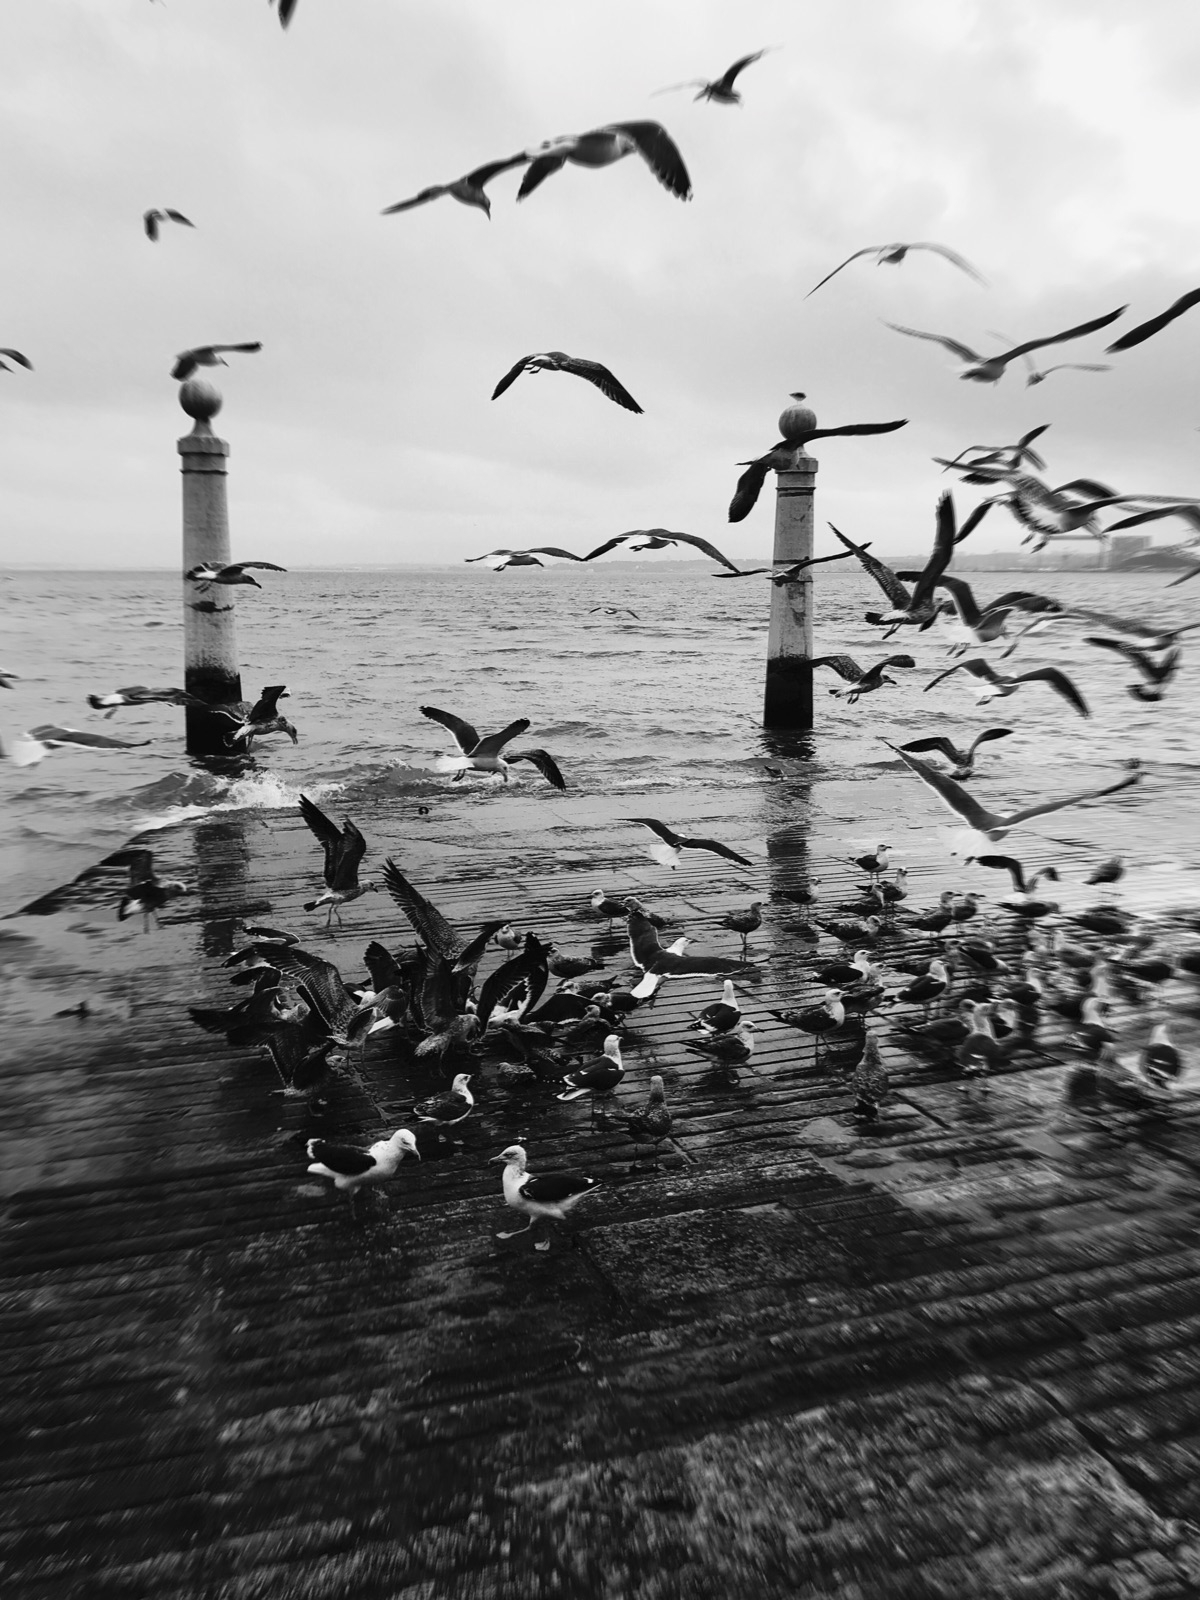 Portugal, lisboa, tejo, seagulls - joanacomeapapa | ello